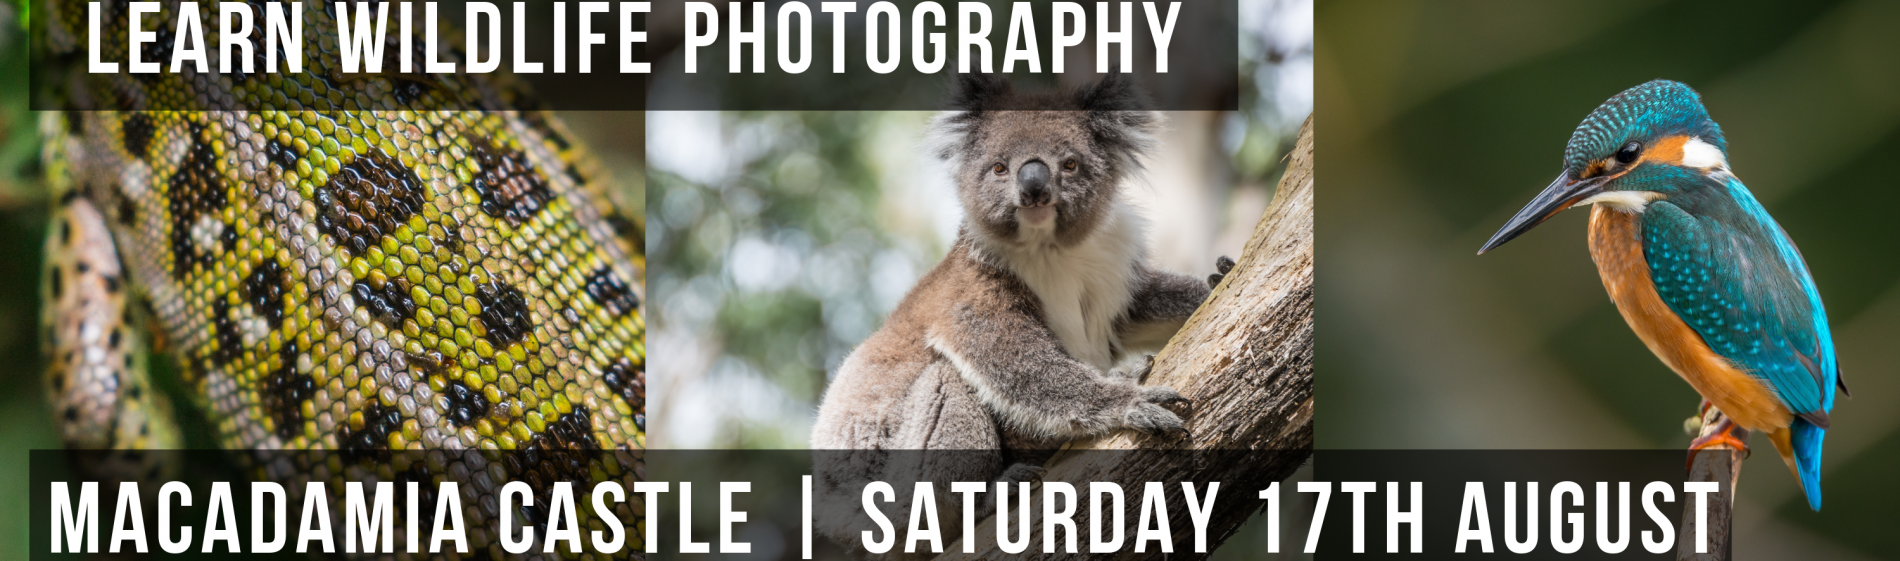 Wildlife_photography_banner